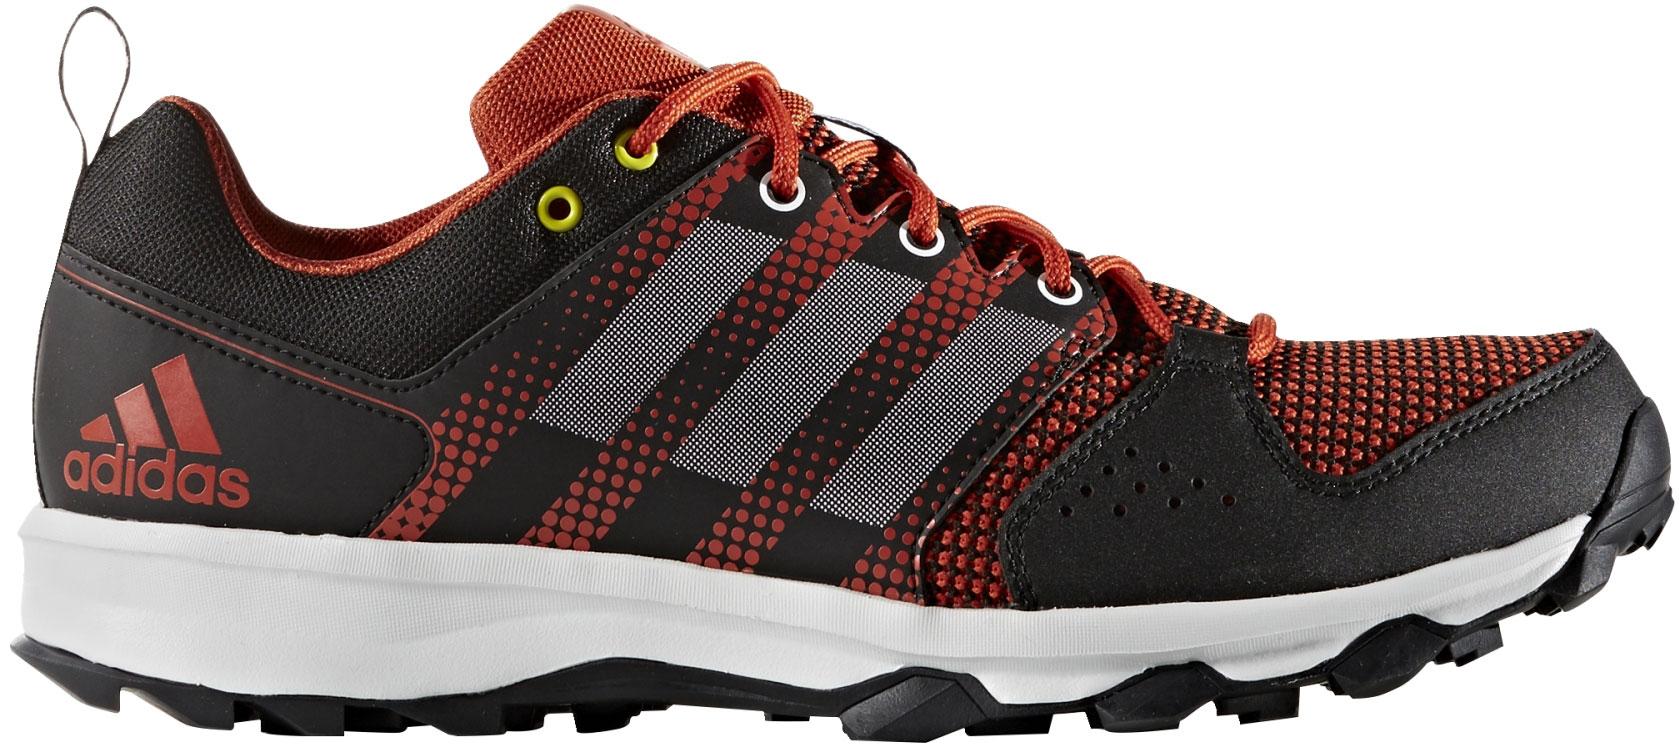 Adidas Galaxy M Running Shoes